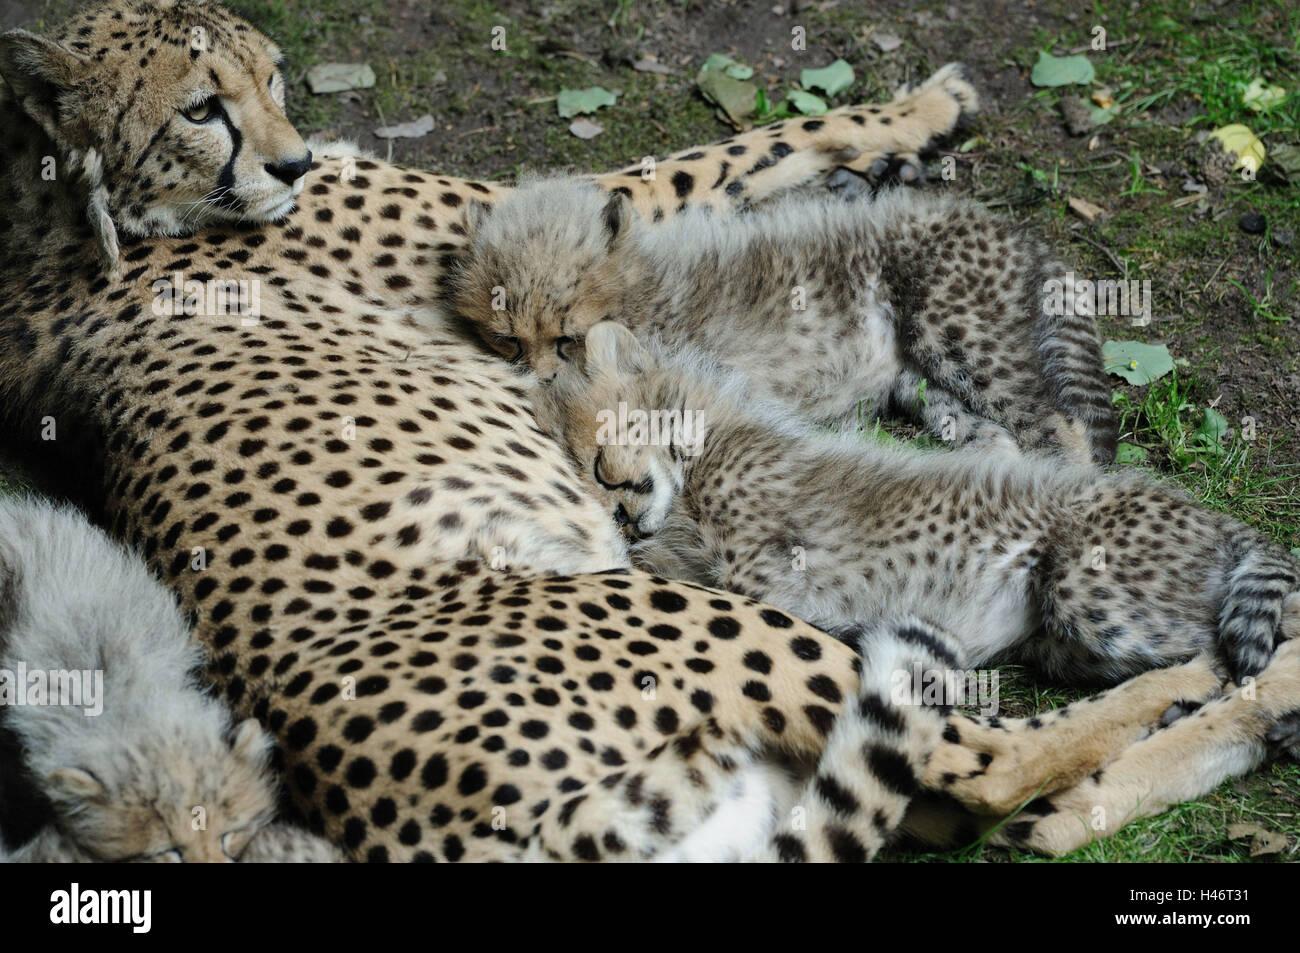 cheetah sleeping stock photos cheetah sleeping stock images page